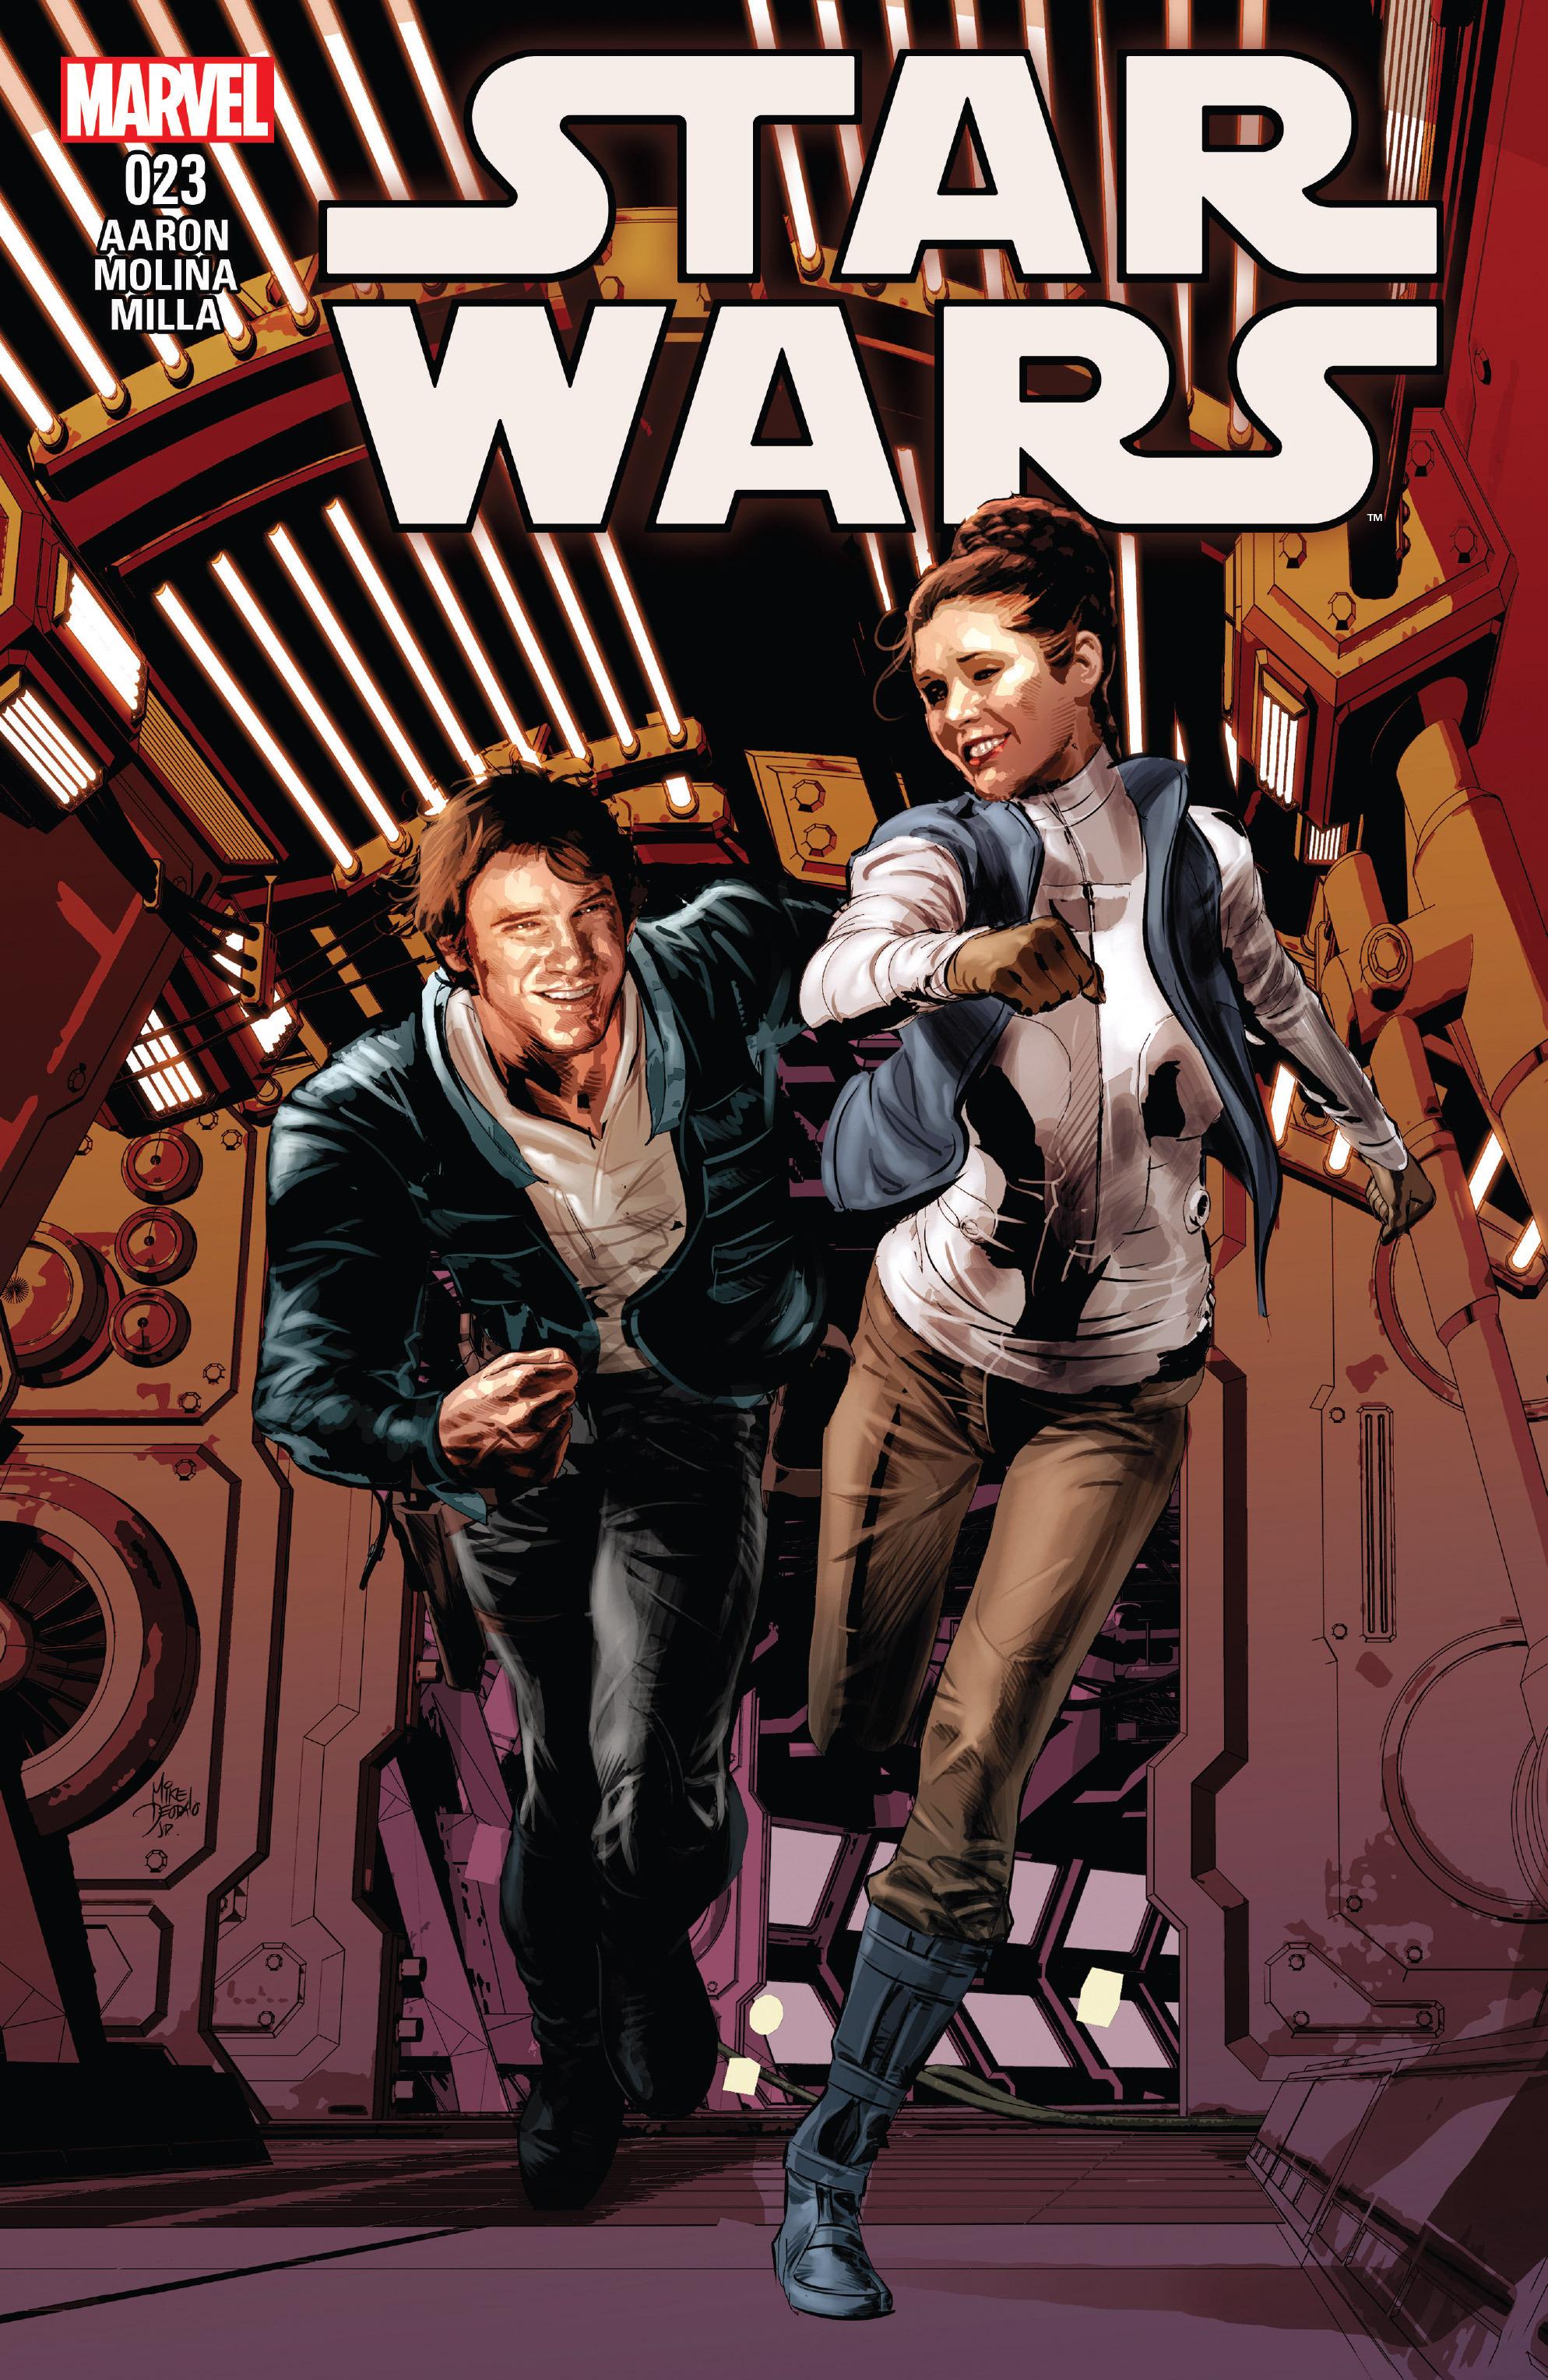 Star-Wars-023-000a